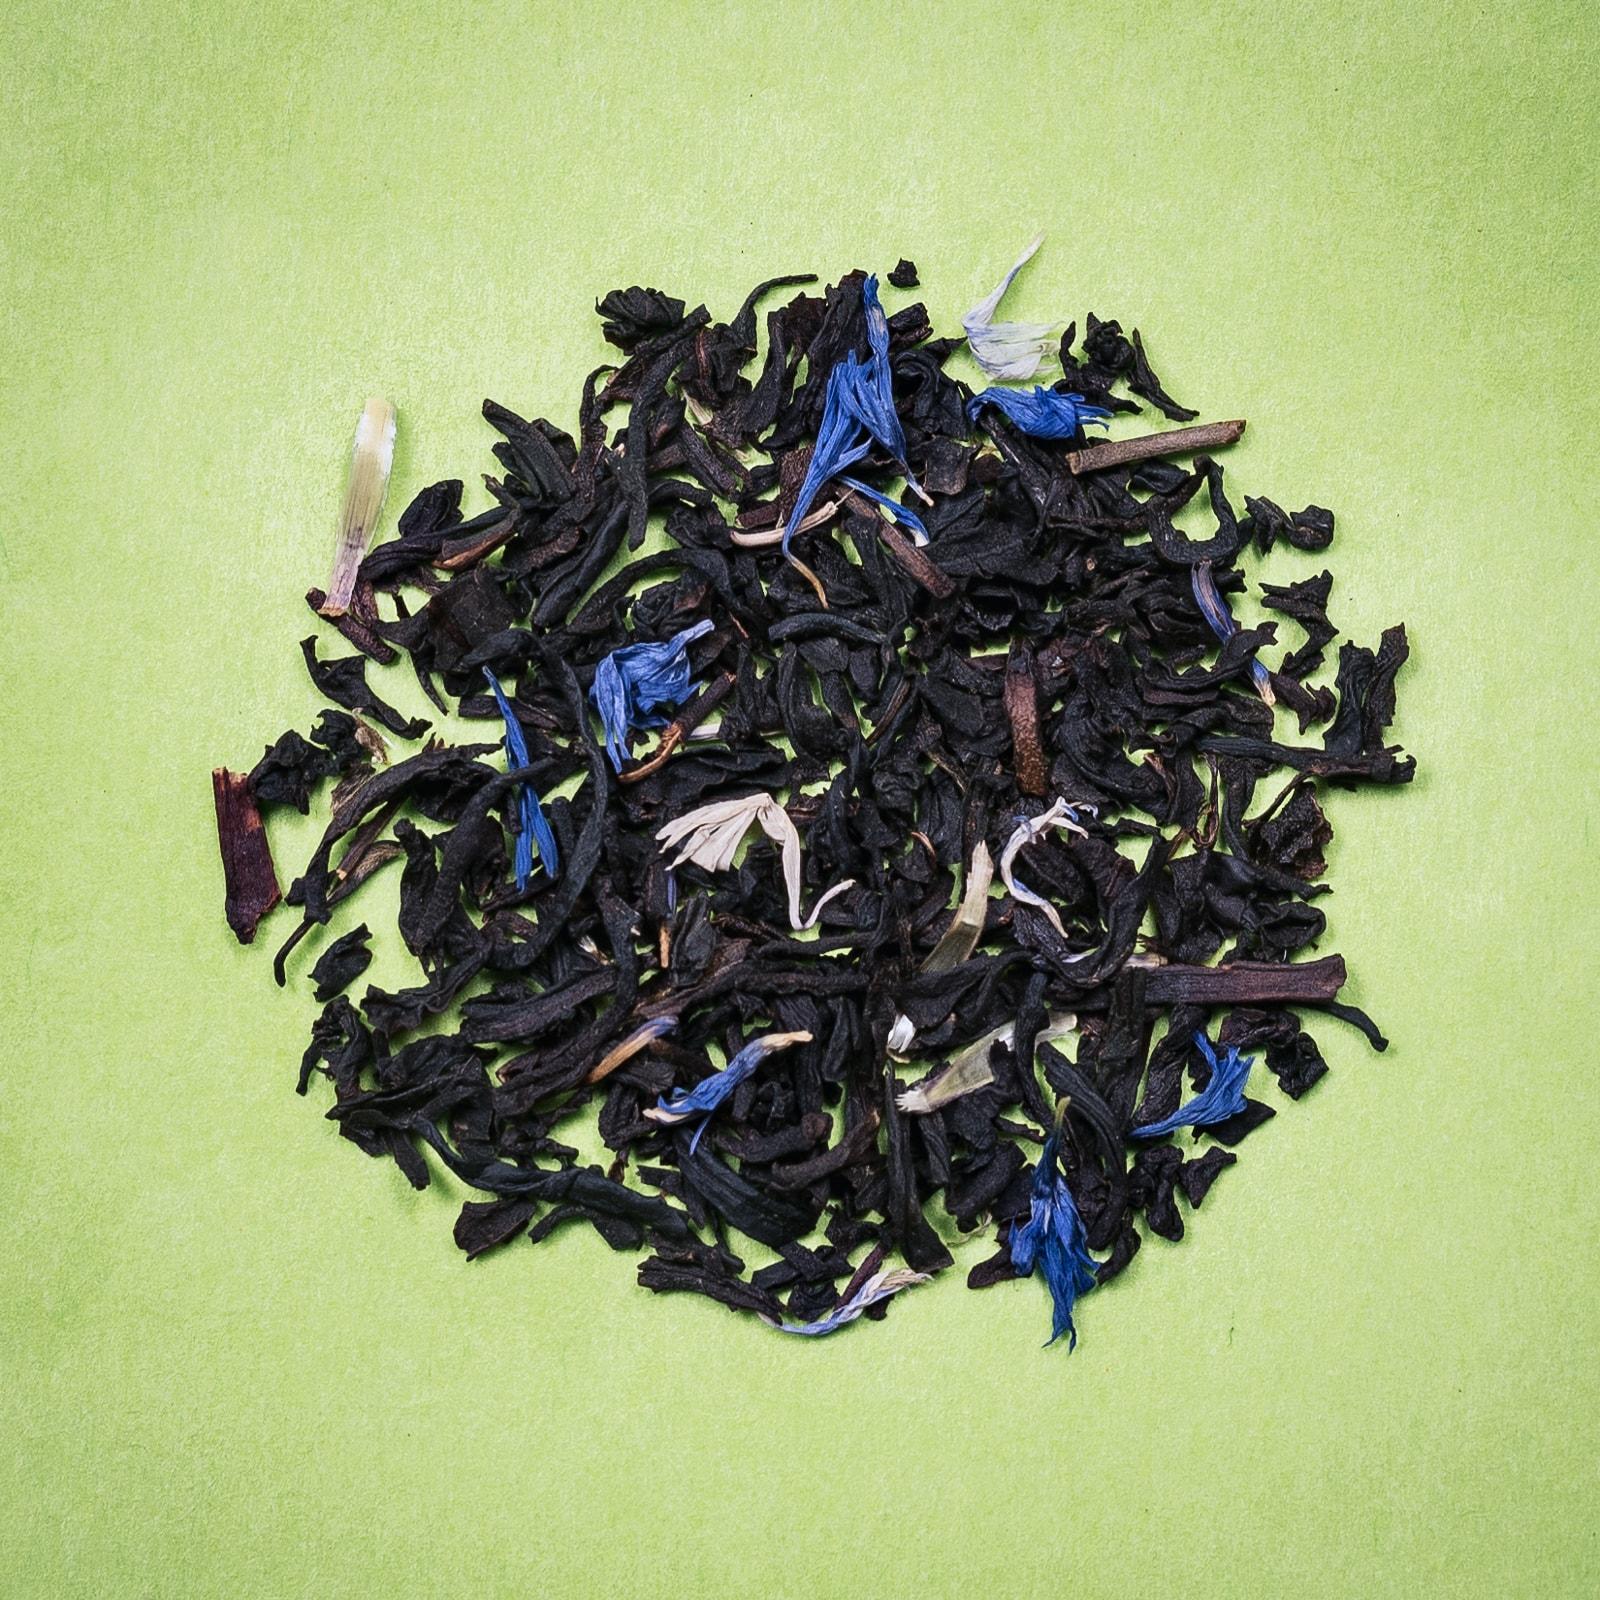 Anbassa-artisan-torrefacteur-the-noir-aromatise-Montagne-Bleue-GUP